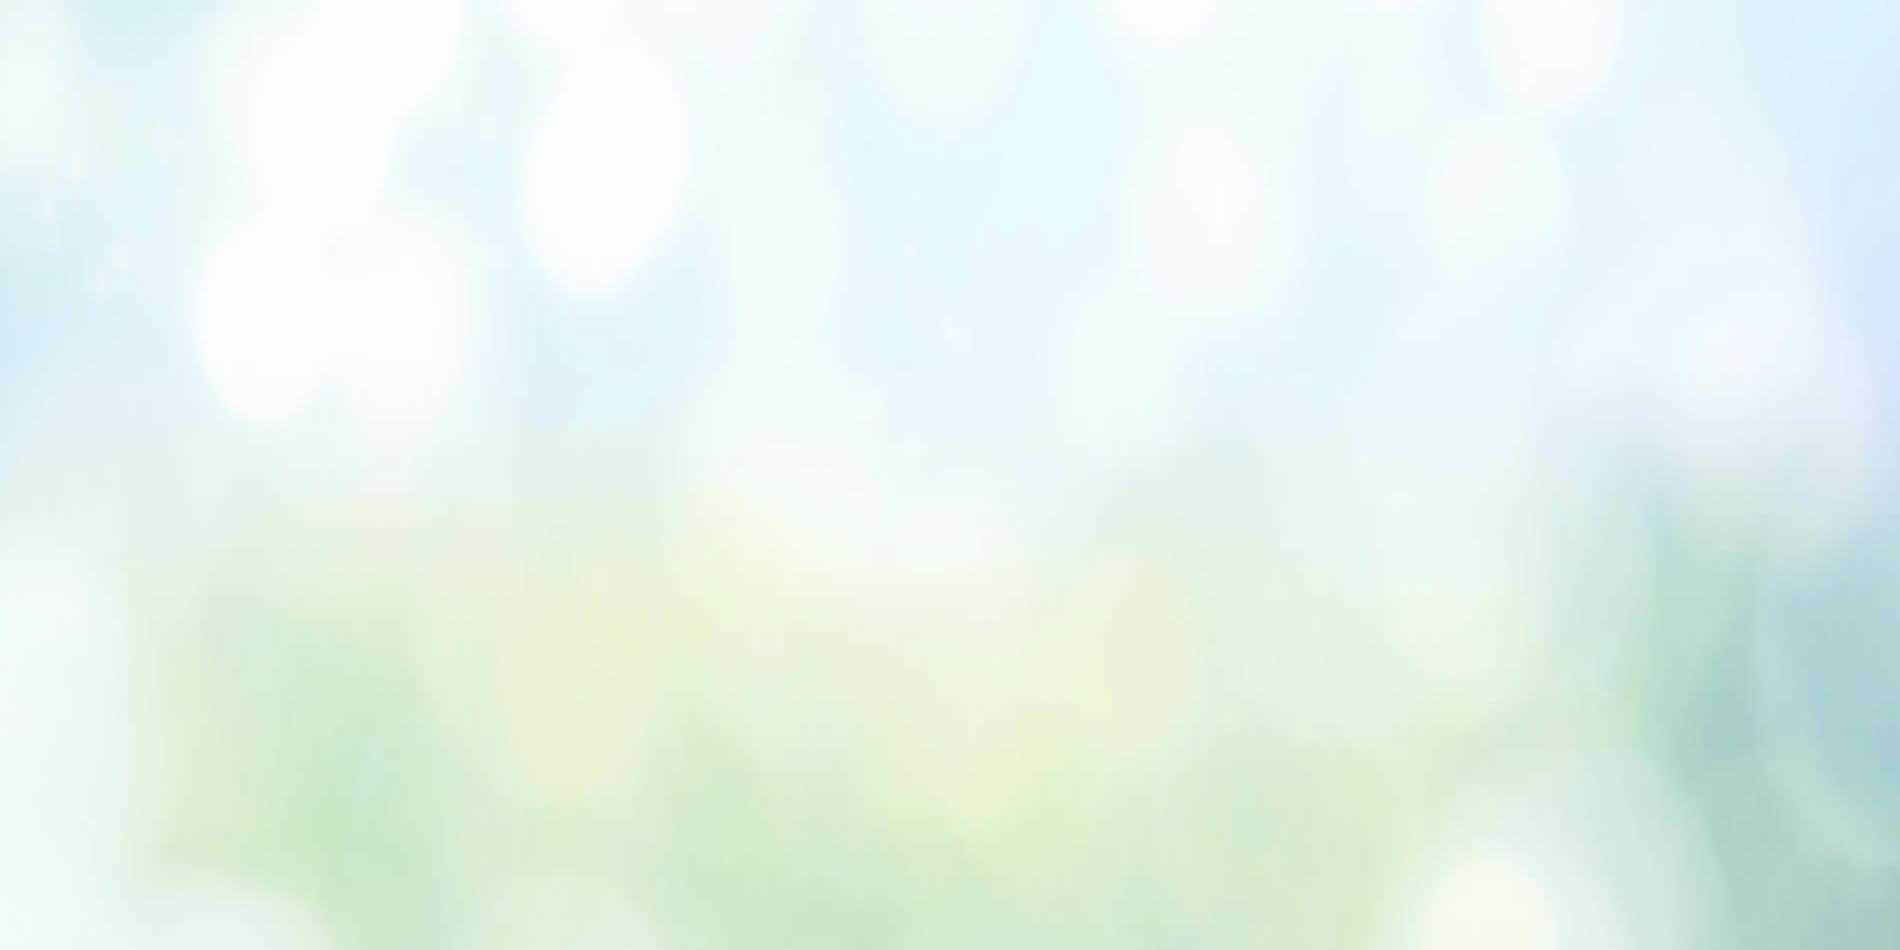 bg_sunnysky_light_tall